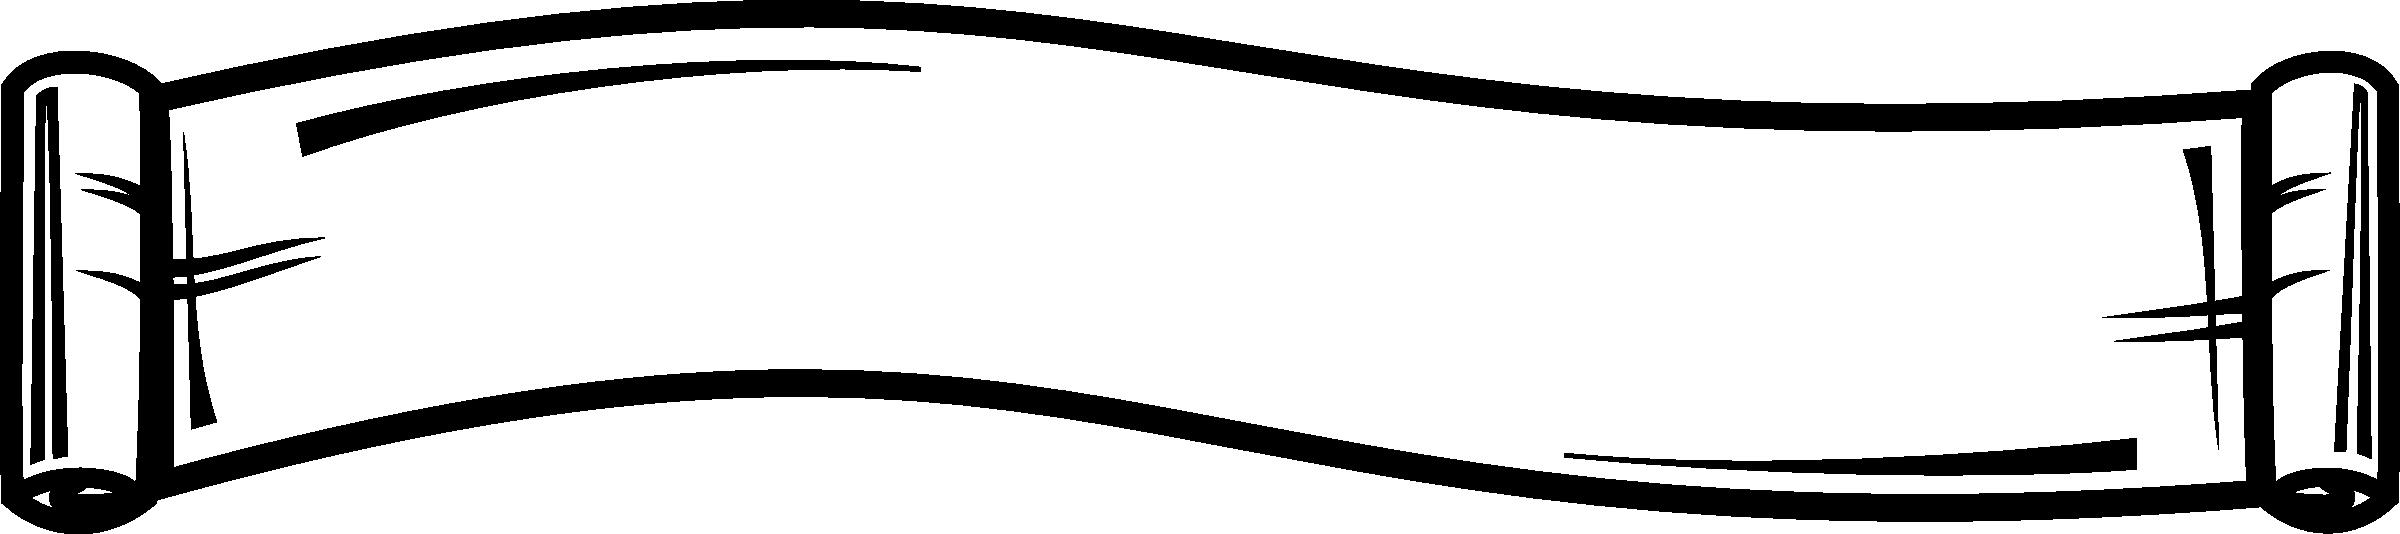 Simple scroll clip.